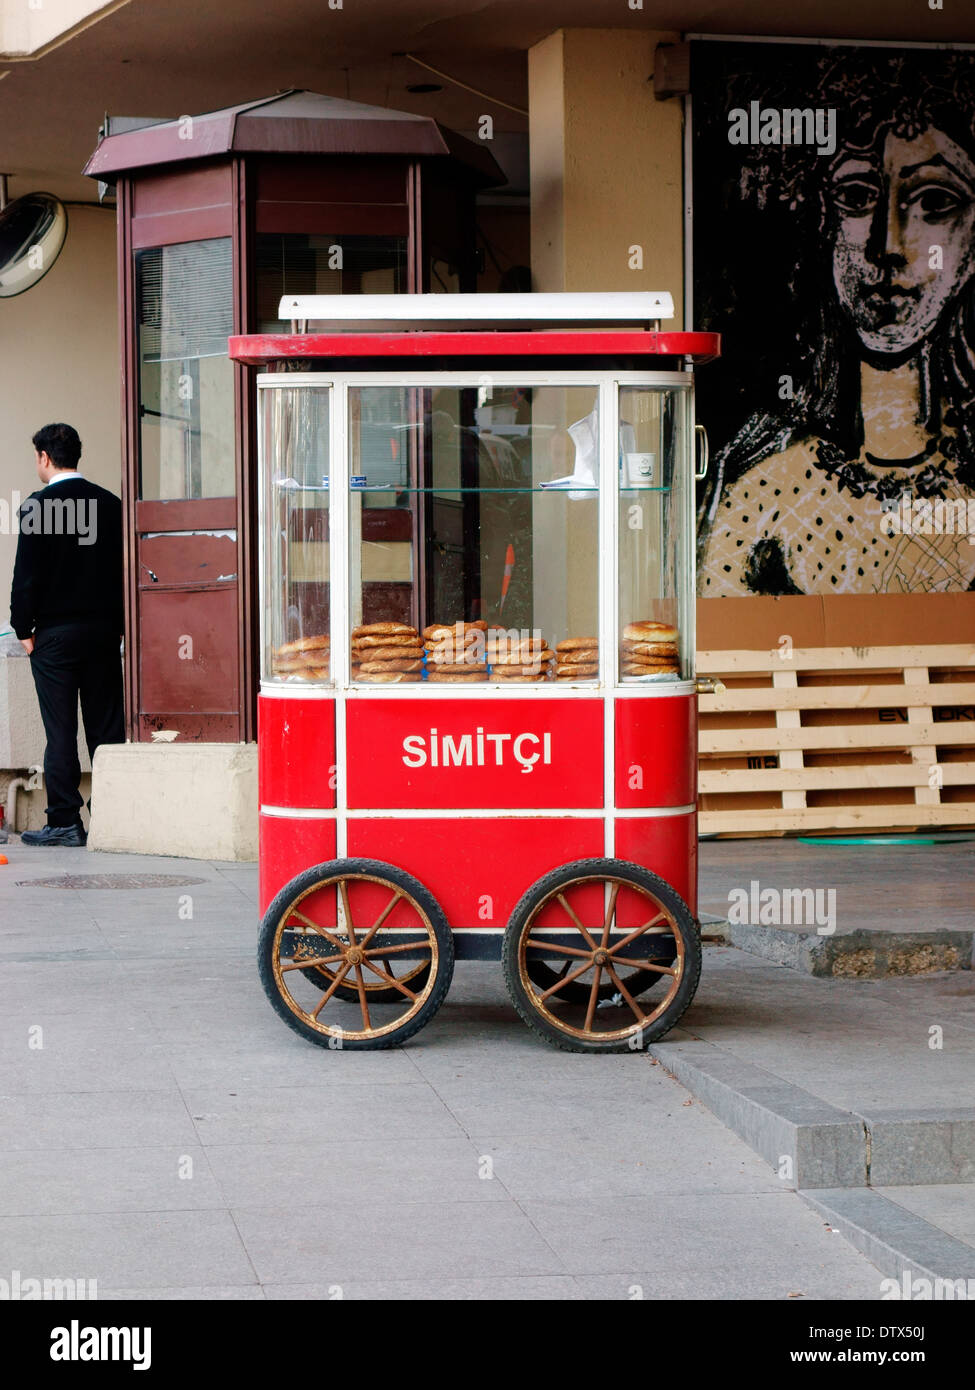 Simit stand, Turkey - Stock Image